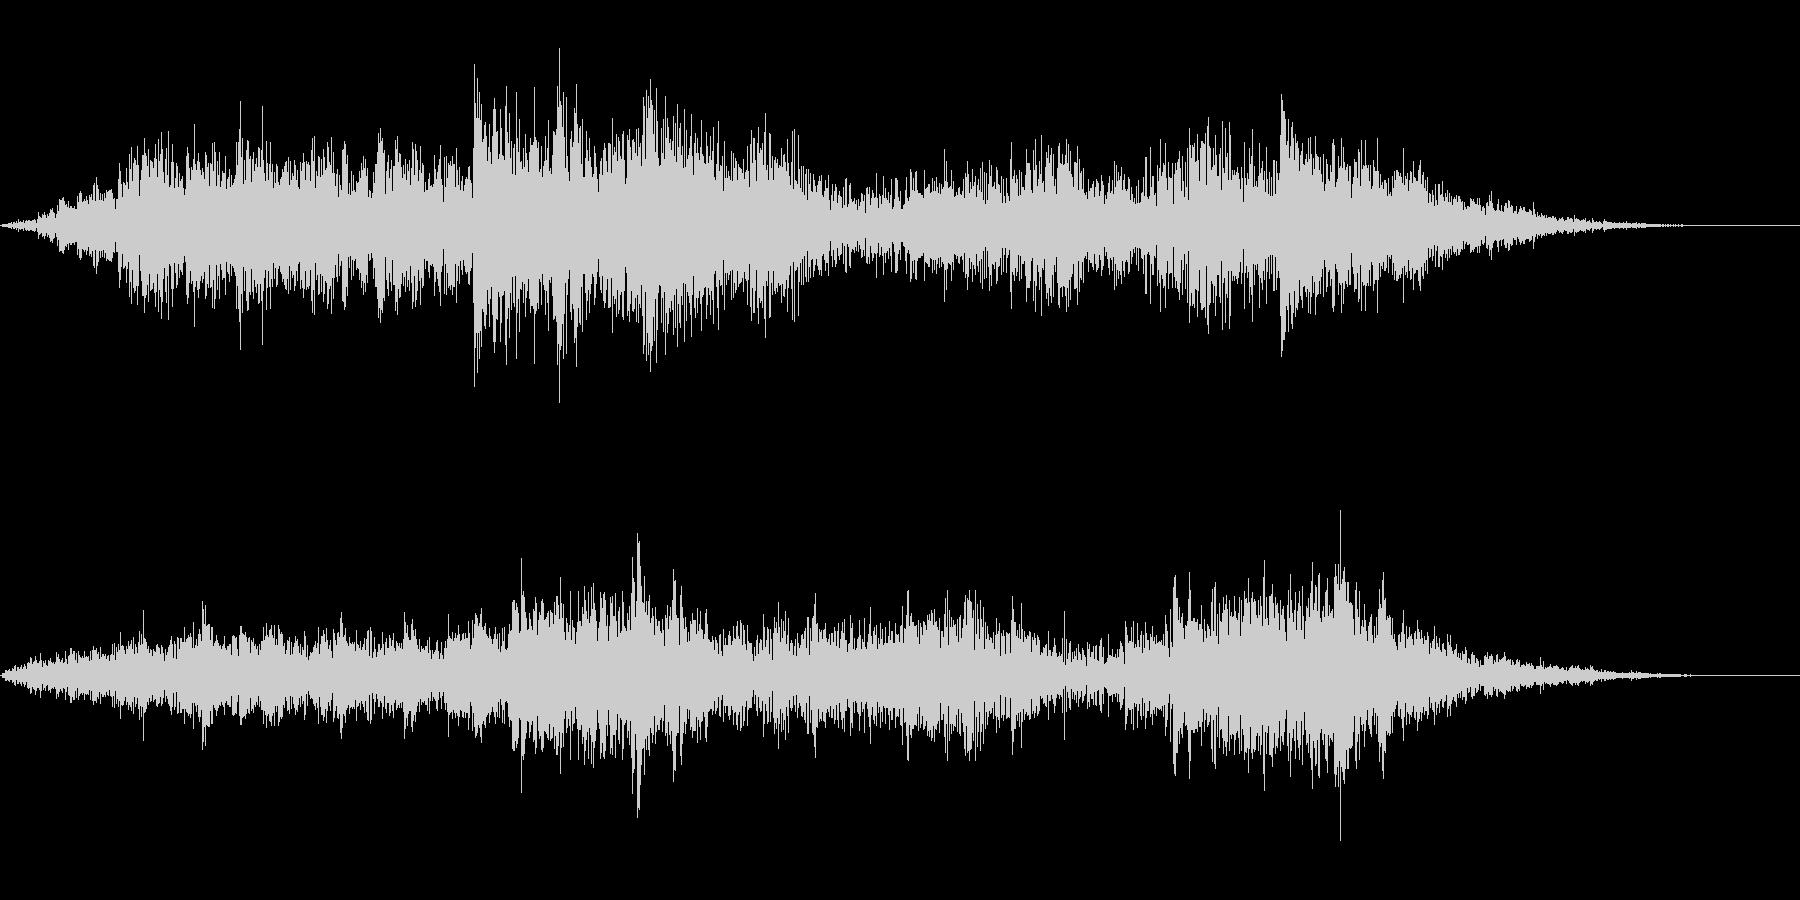 【SE 効果音】奇妙な音7の未再生の波形